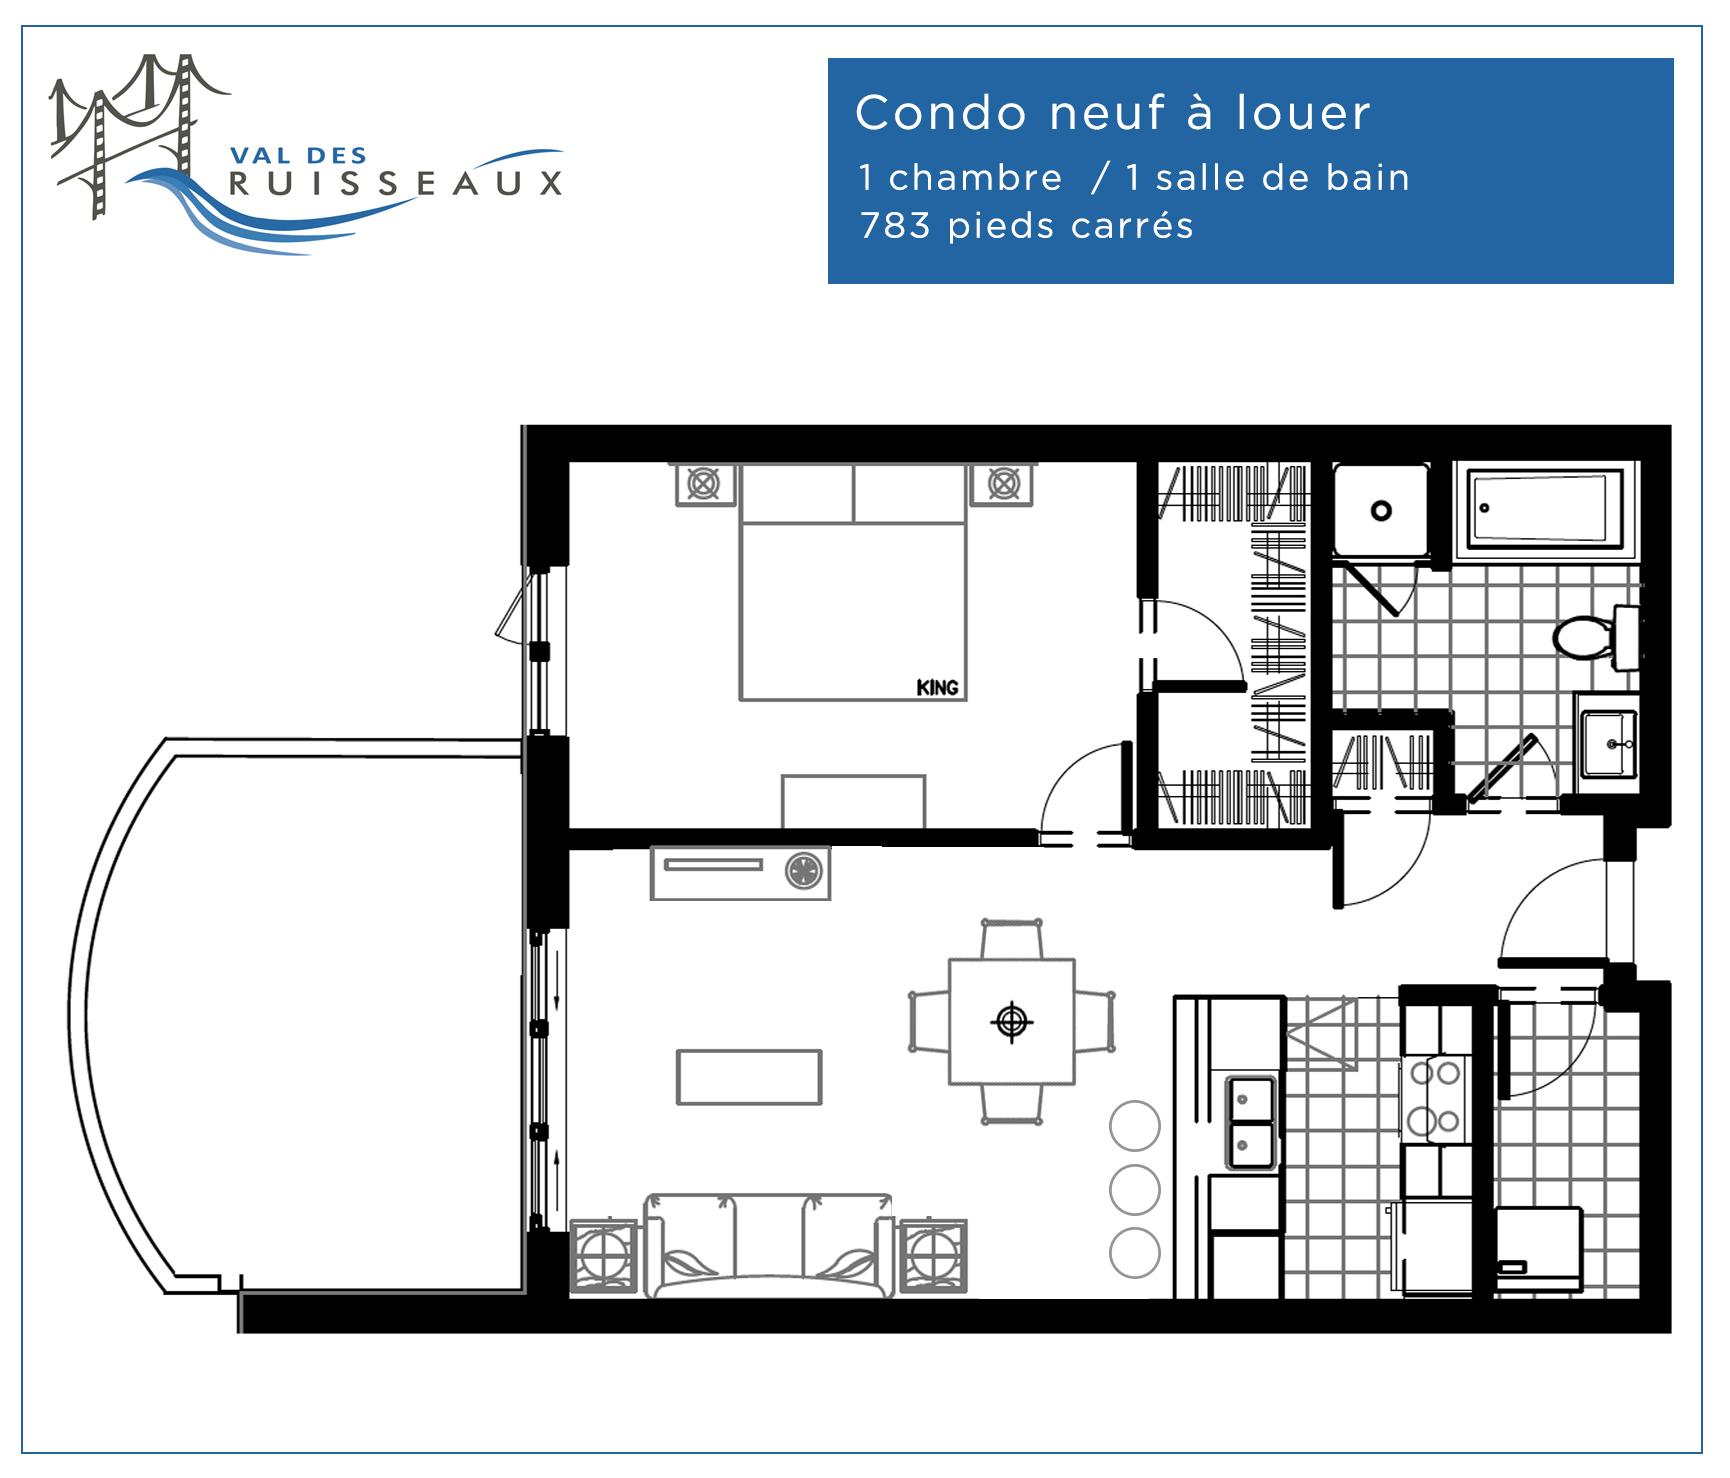 plans-vdr-1cac-v3-fr